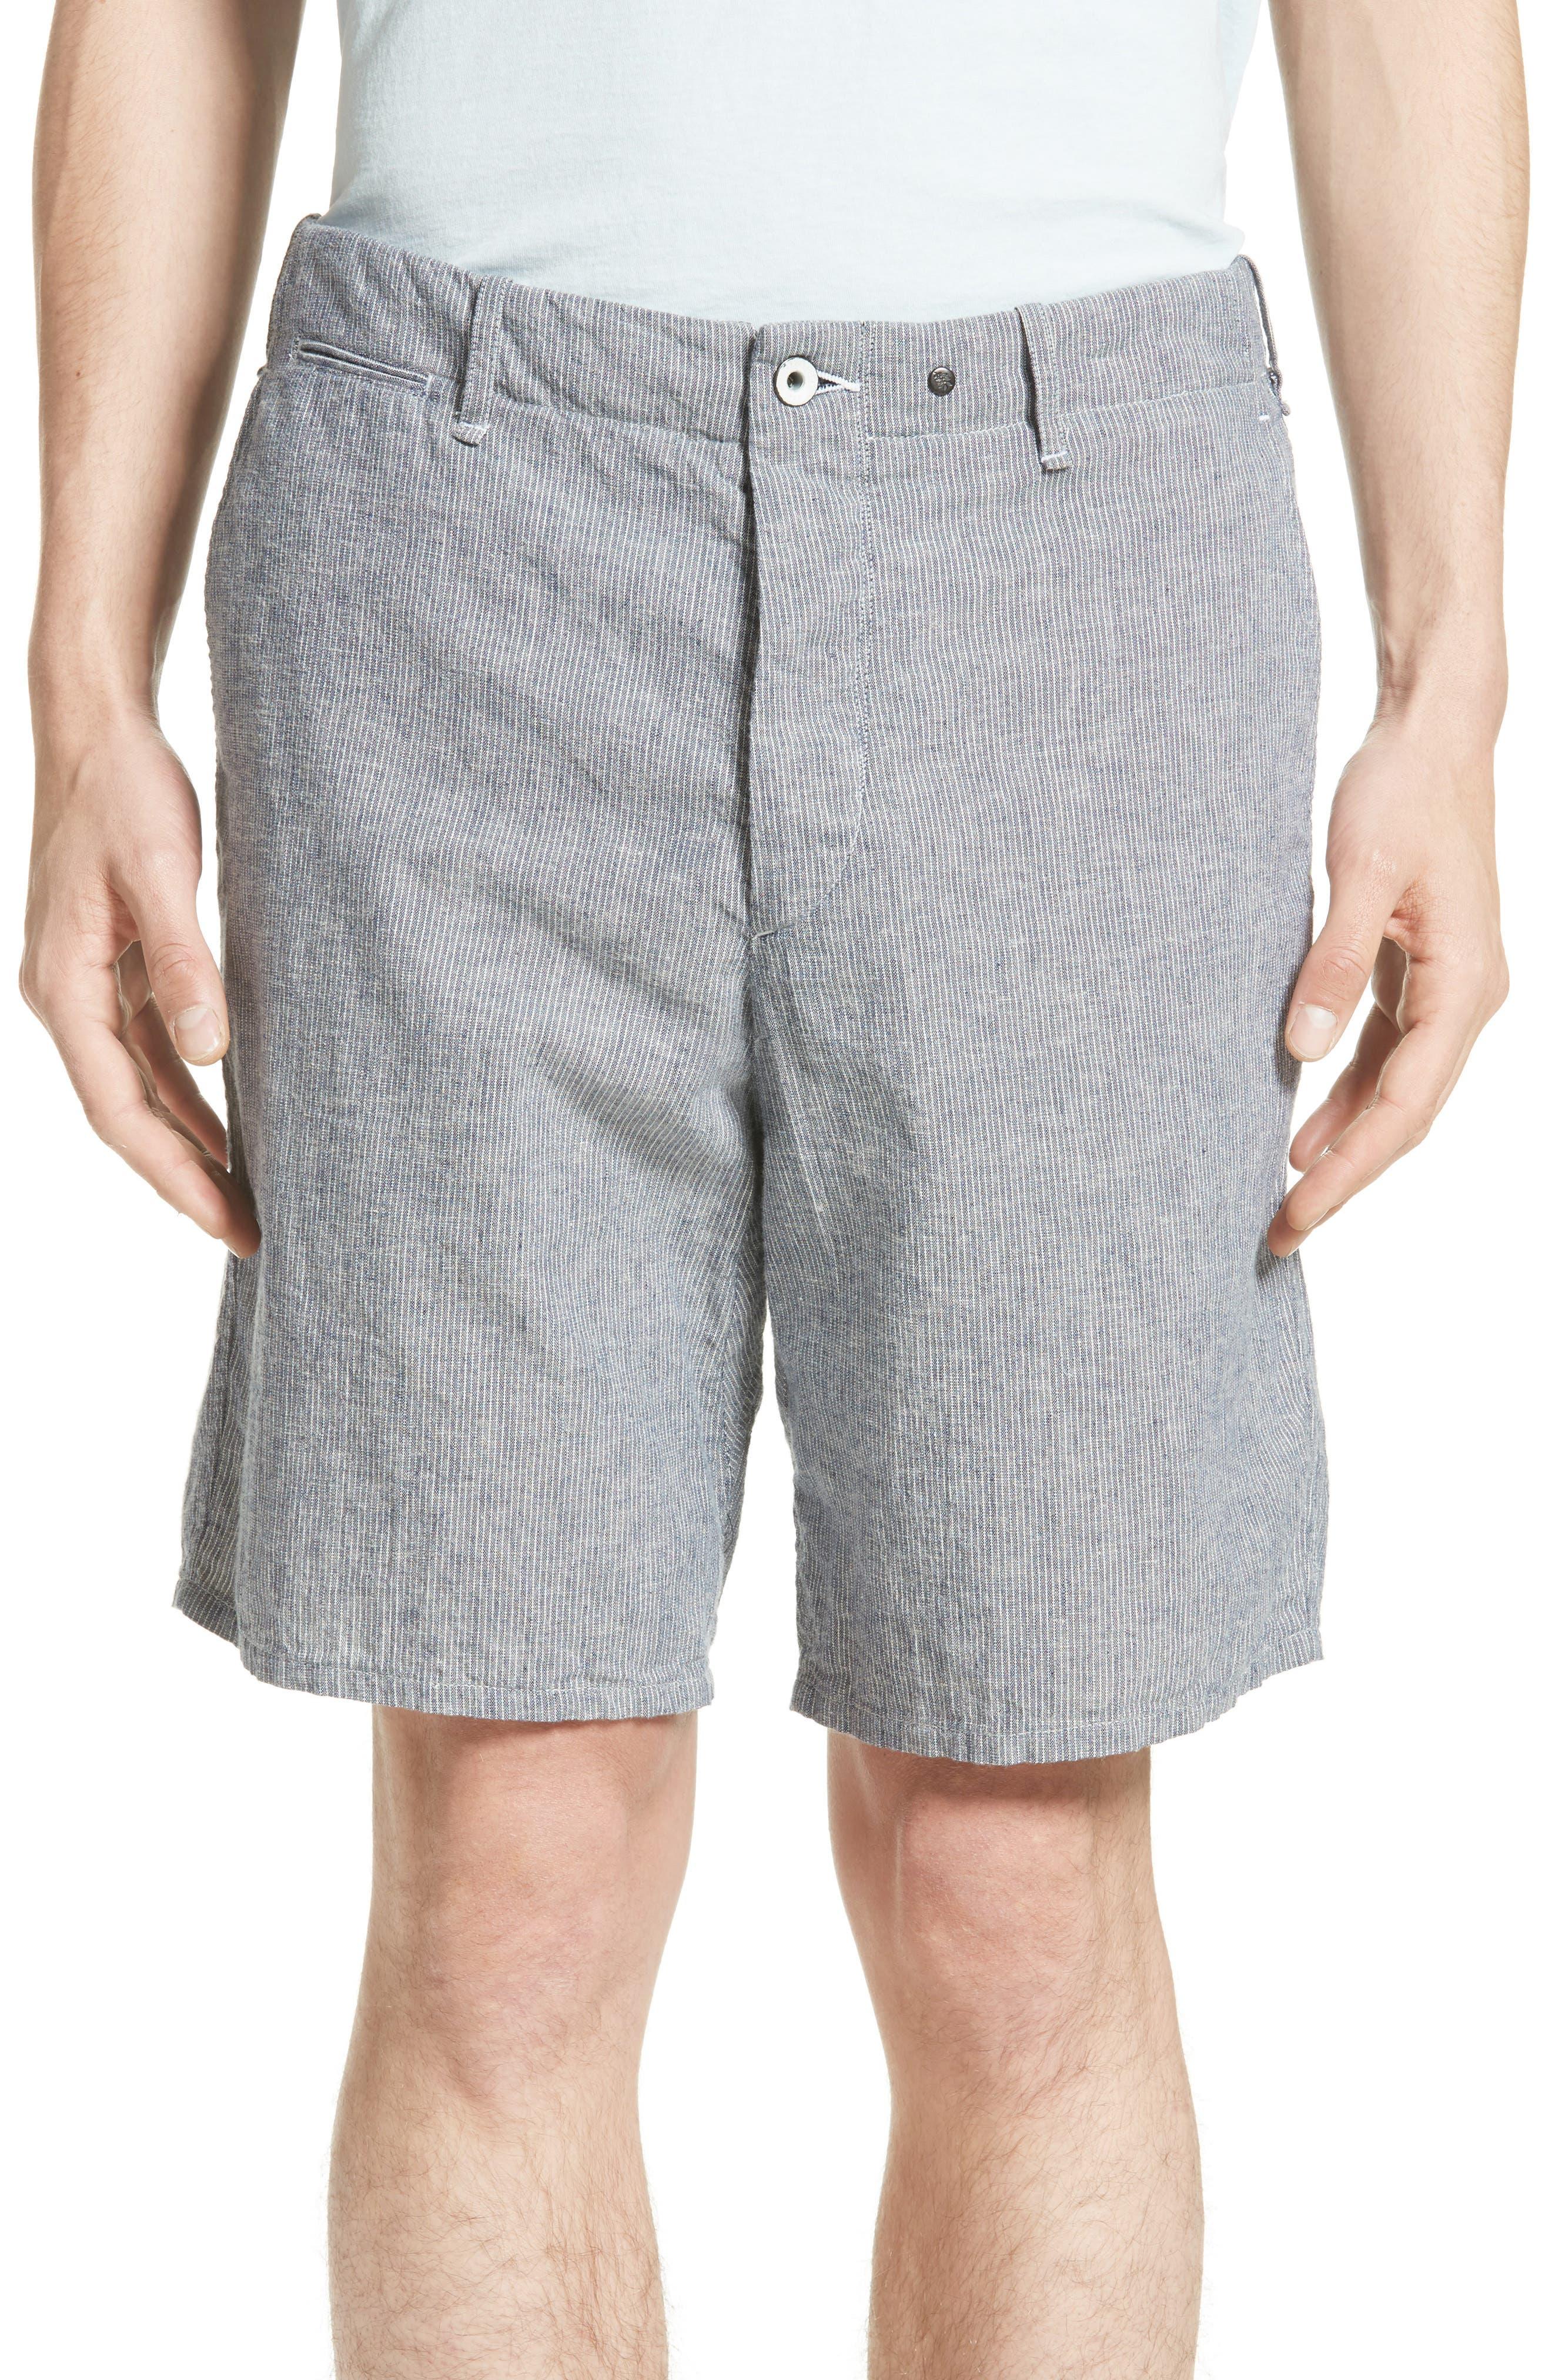 Alternate Image 1 Selected - rag & bone Beach II Shorts